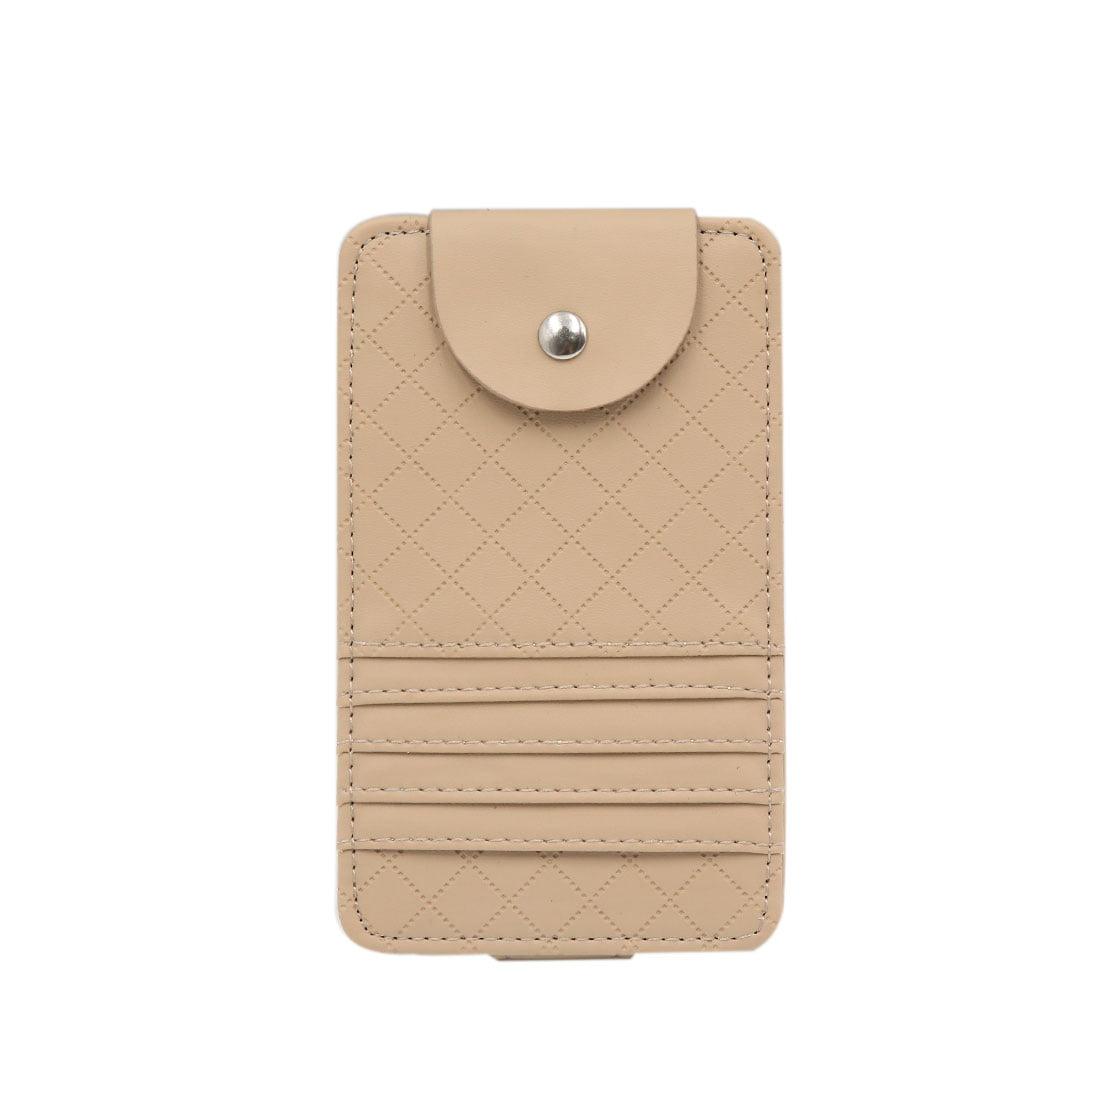 Beige Faux Leather Business Name Credit Card Holder Case Bag For